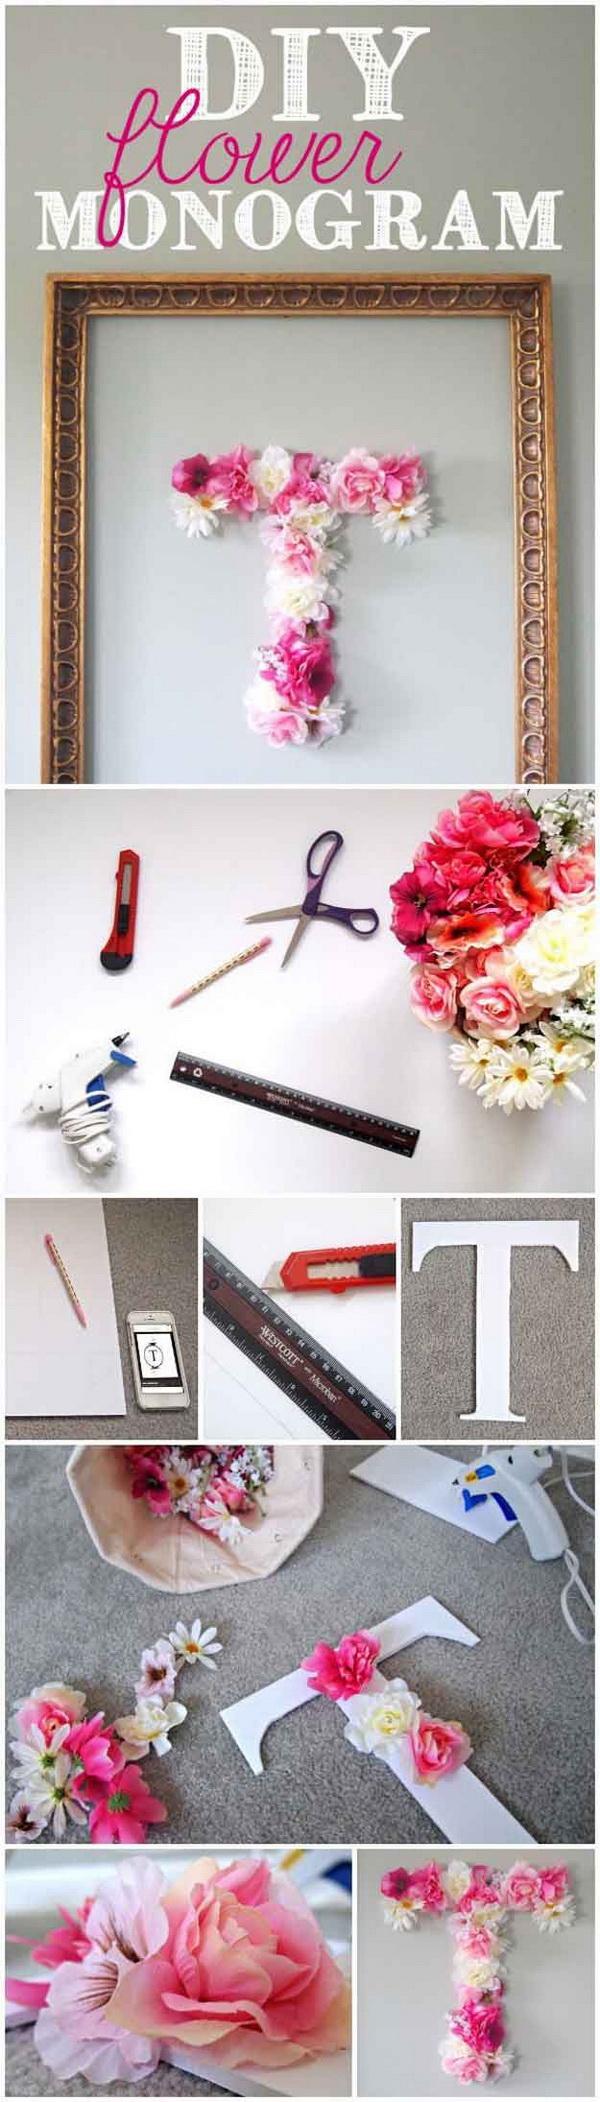 DIY Flower Monogram Wall Art.